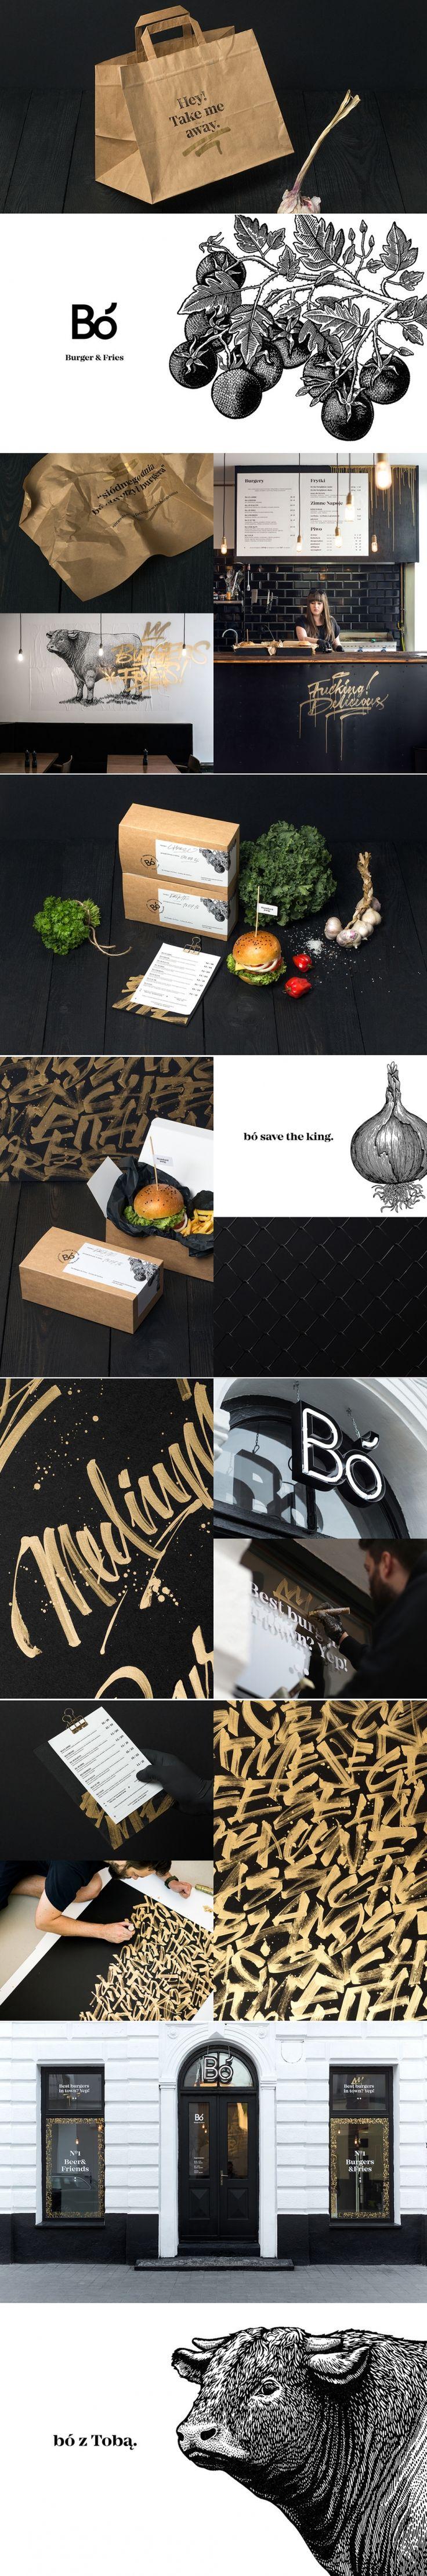 Bó Burger and fries — The Dieline | Packaging & Branding Design & Innovation News